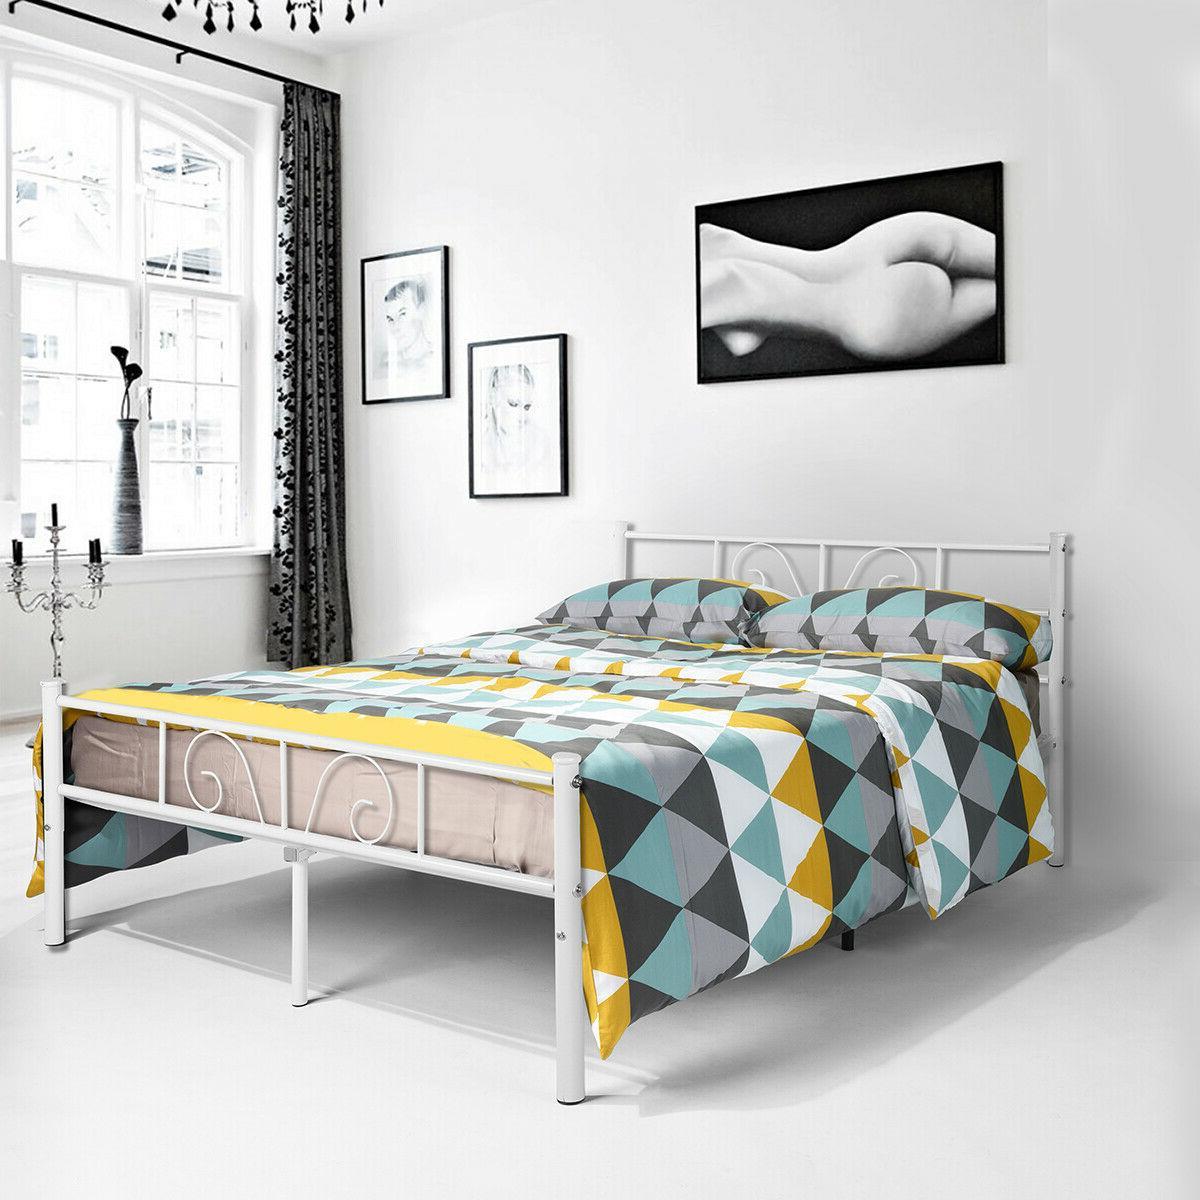 metal full size bed frame mattress foundation